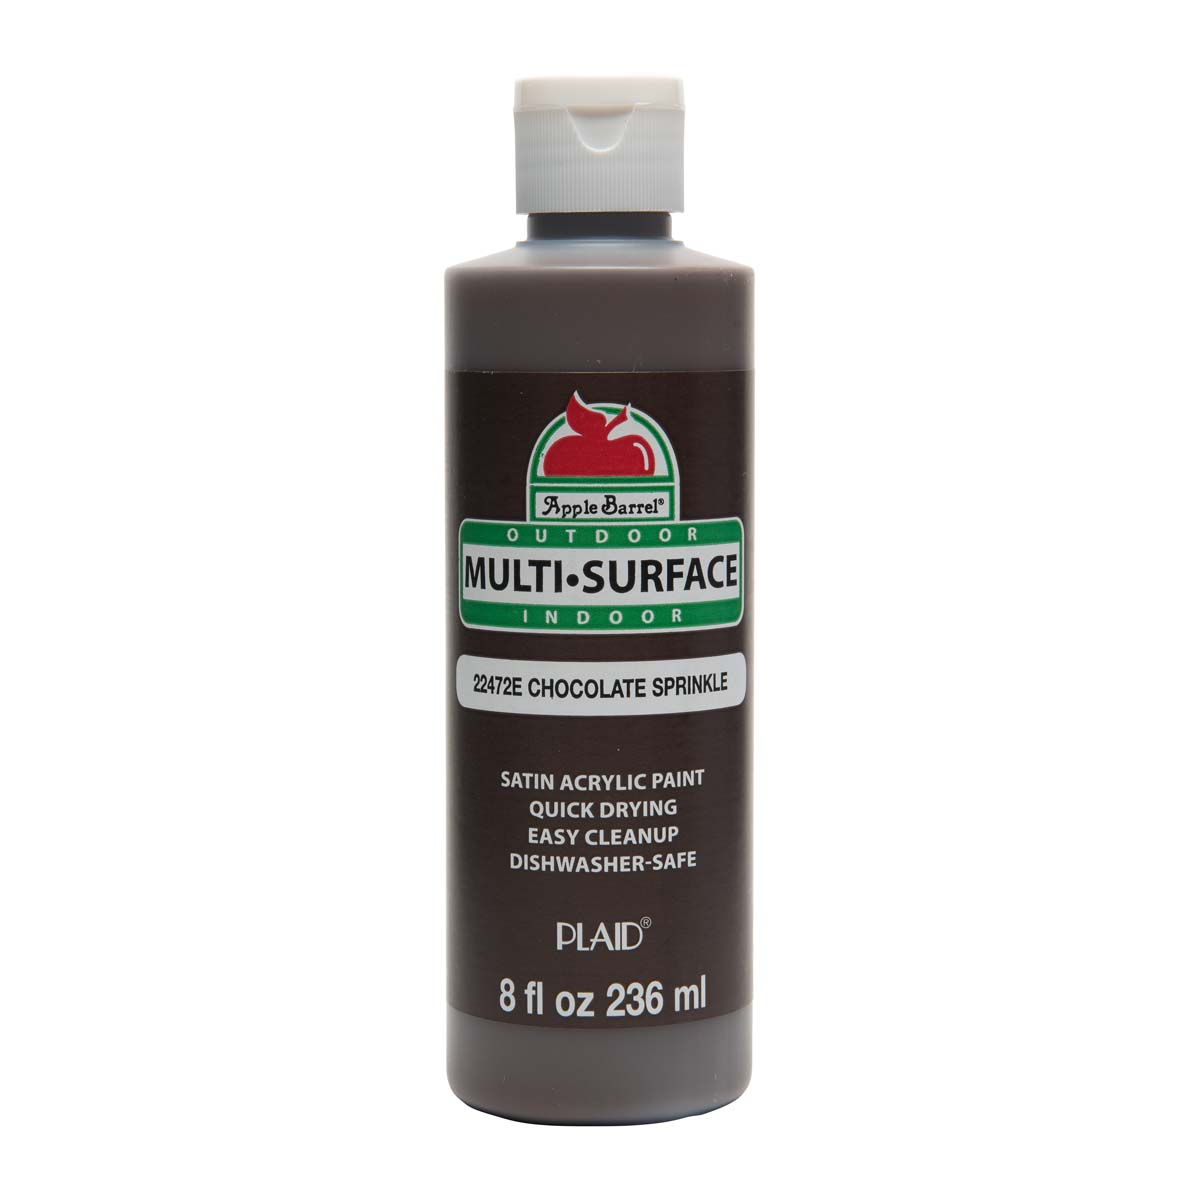 Apple Barrel ® Multi-Surface Satin Acrylic Paints - Chocolate Sprinkle, 8 oz.